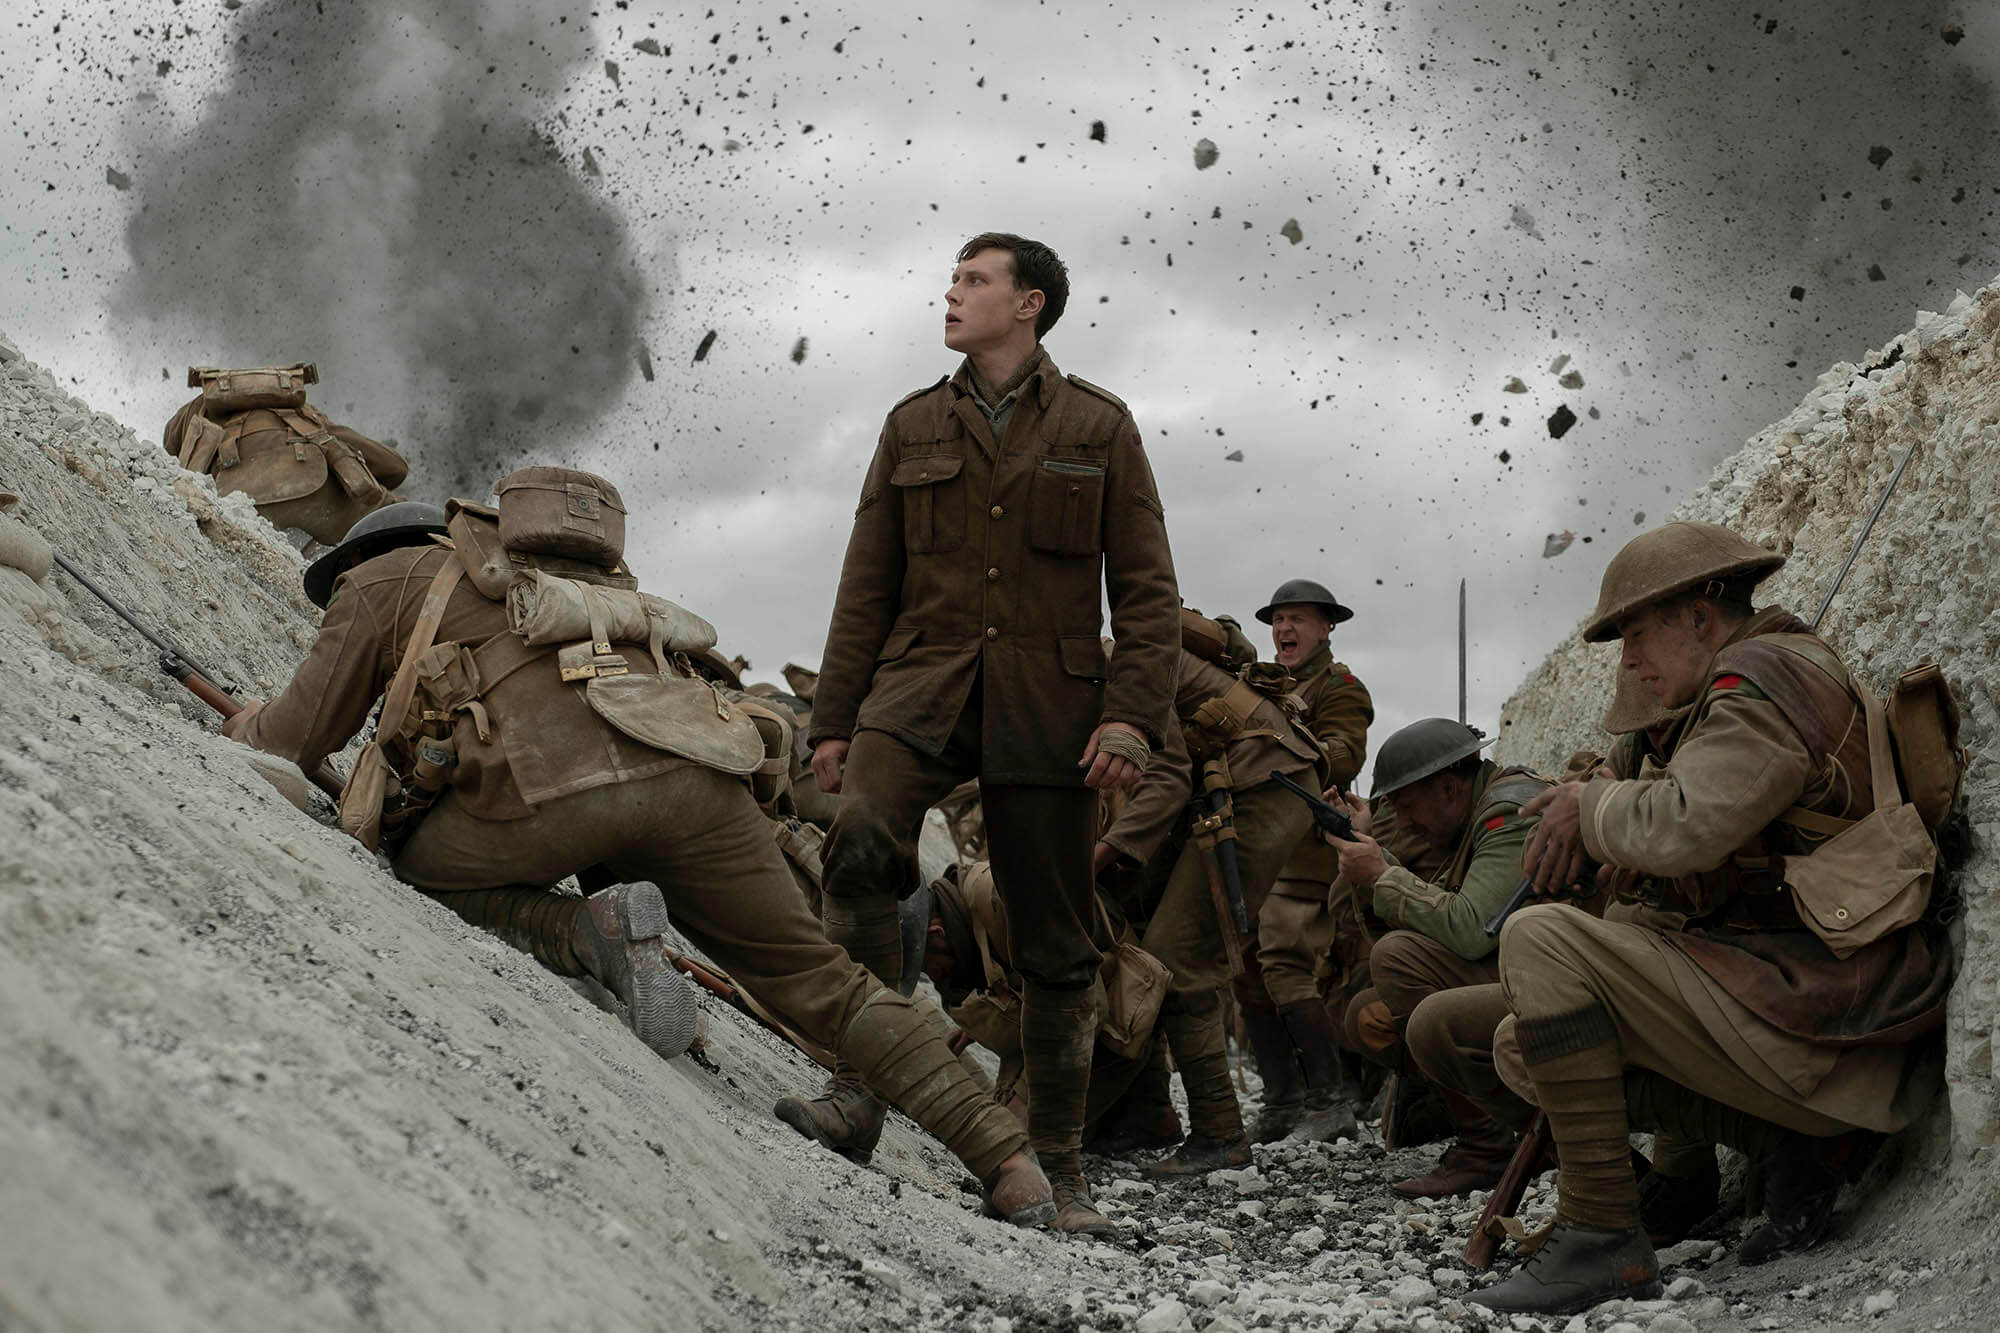 1917, il regista Sam Mendes racconta la Grande Guerra